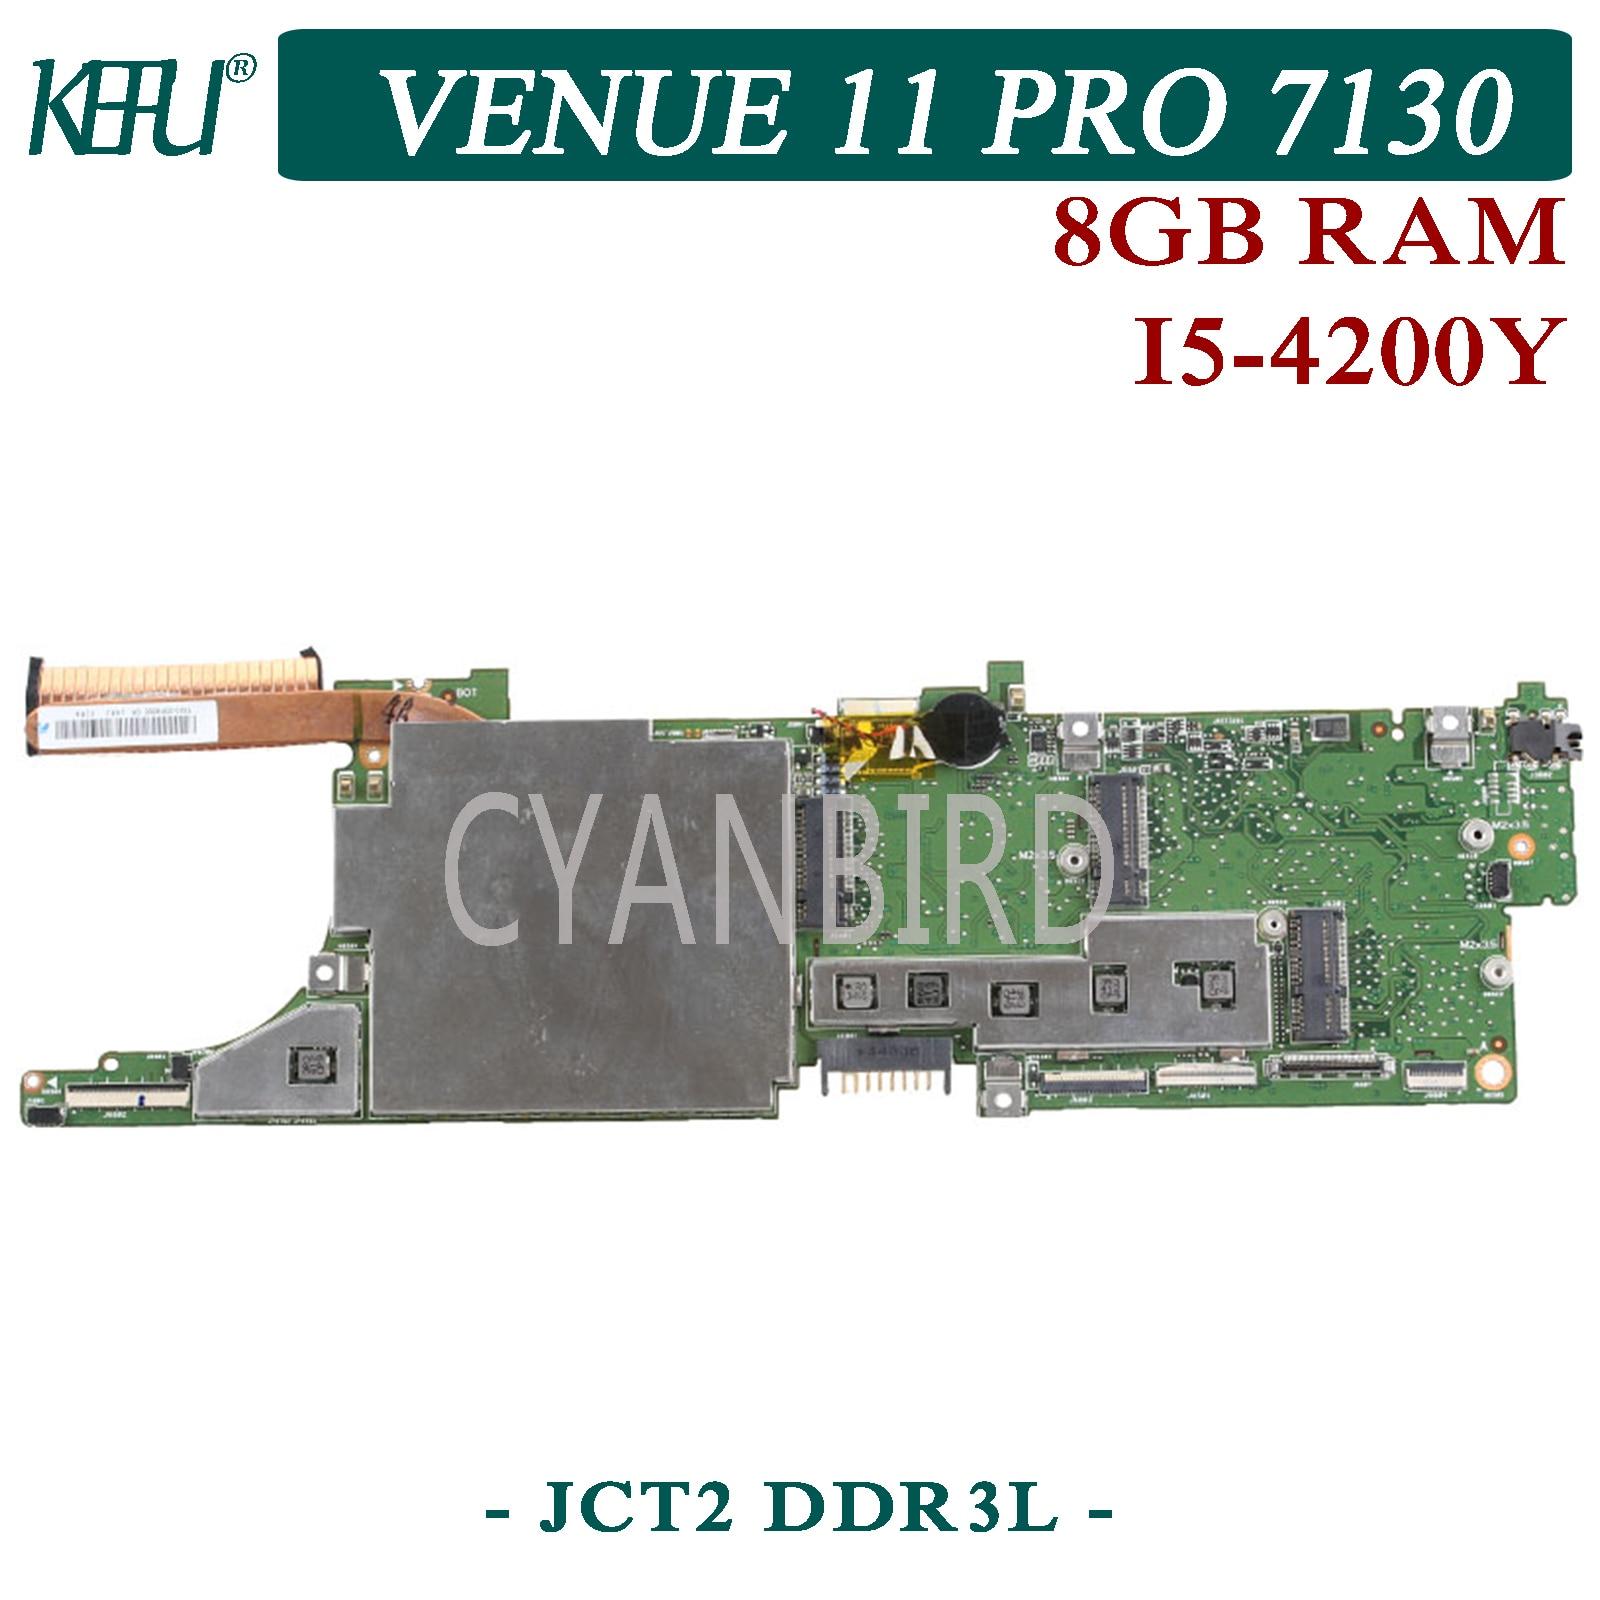 KEFU JCT2 DDR3L اللوحة الأصلية لديل الملعب 11 برو 7130 مع 8GB-RAM I5-4200Y اللوحة المحمول